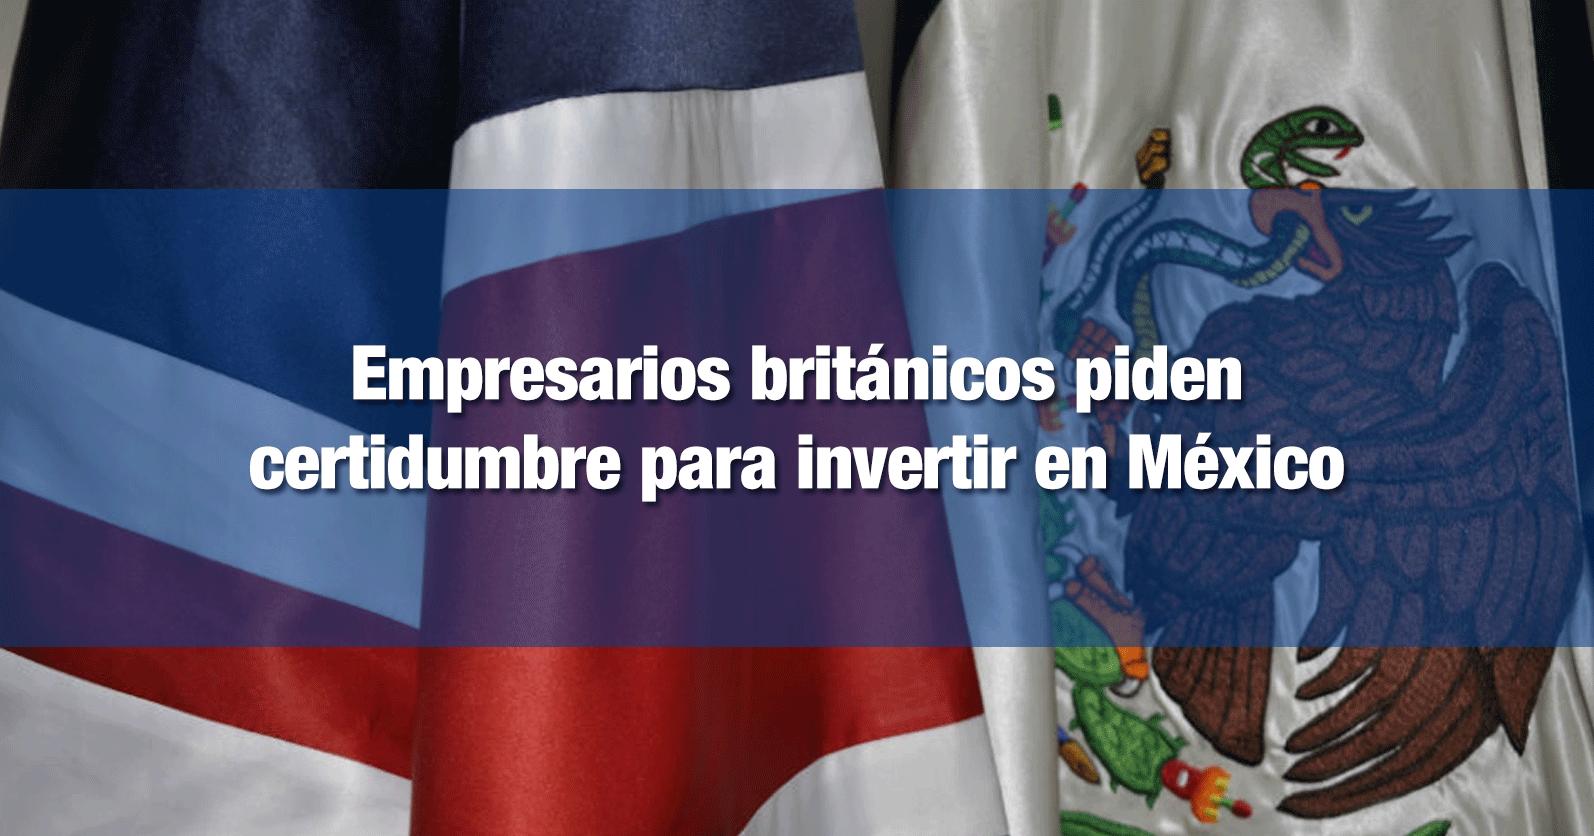 Empresarios británicos piden certidumbre para invertir en México